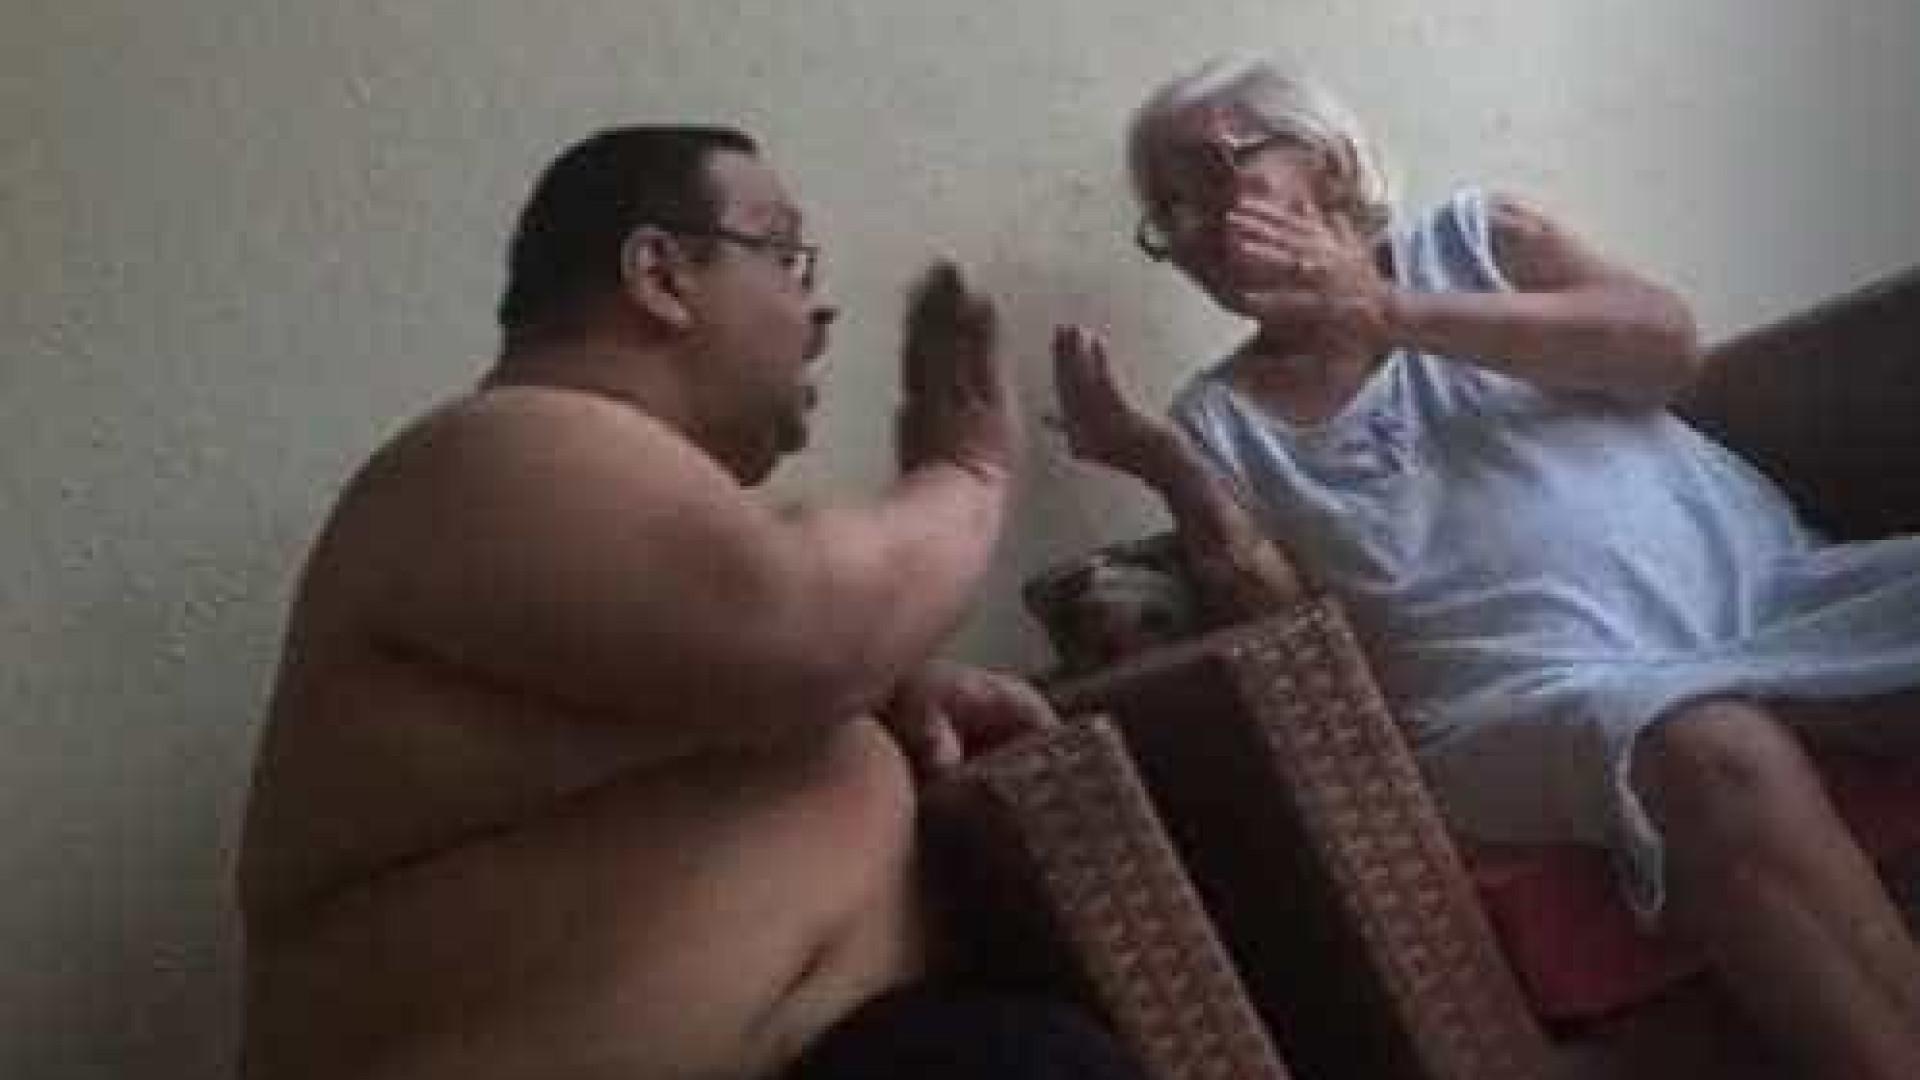 Filho é flagrado agredindo mãe idosa em São Luís